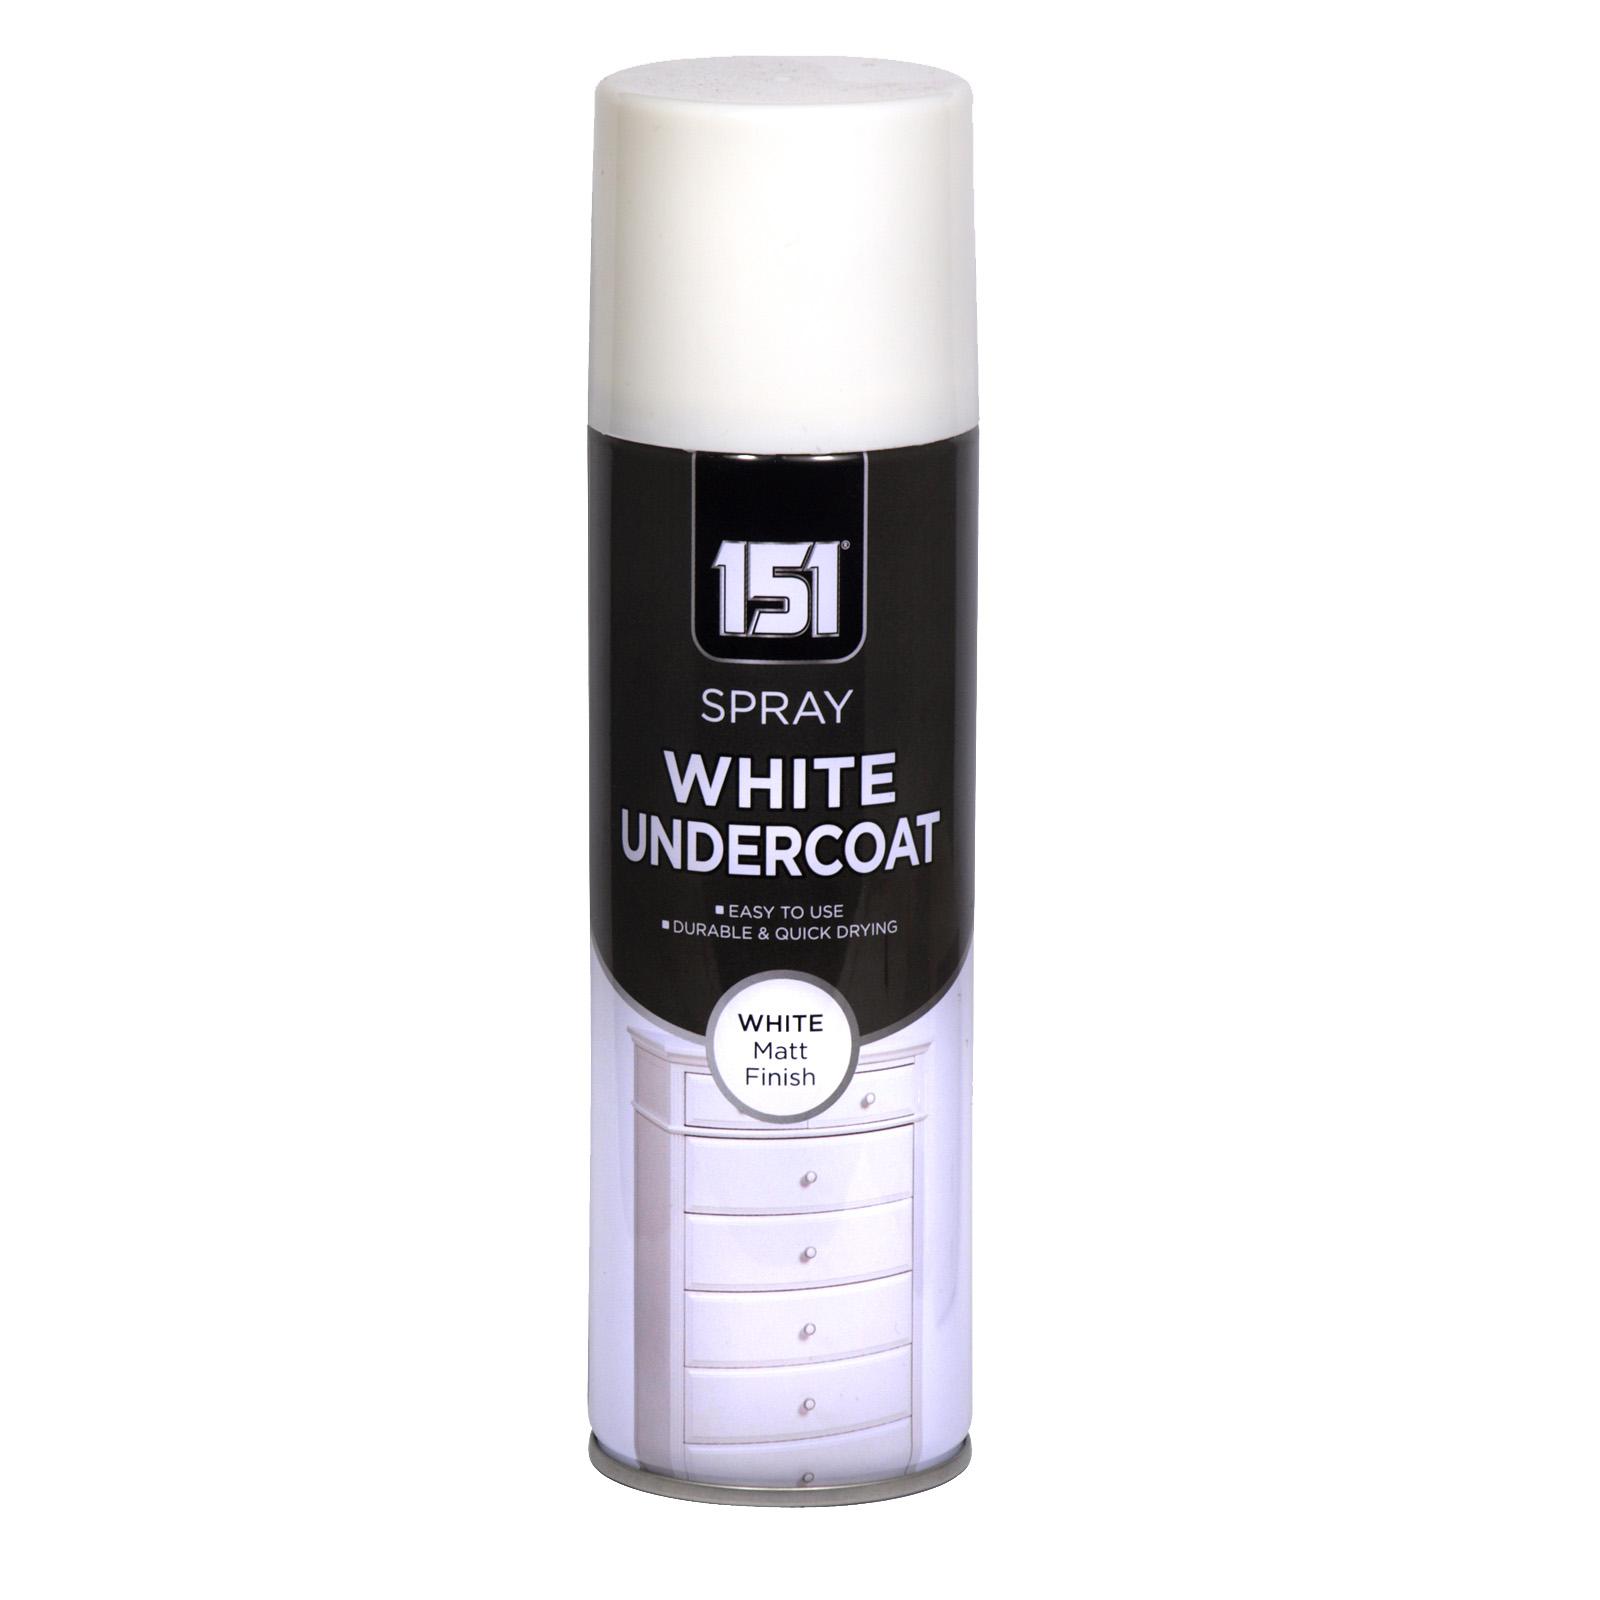 151 SPRAY PAINT 250ML WHITE UNDERCOAT